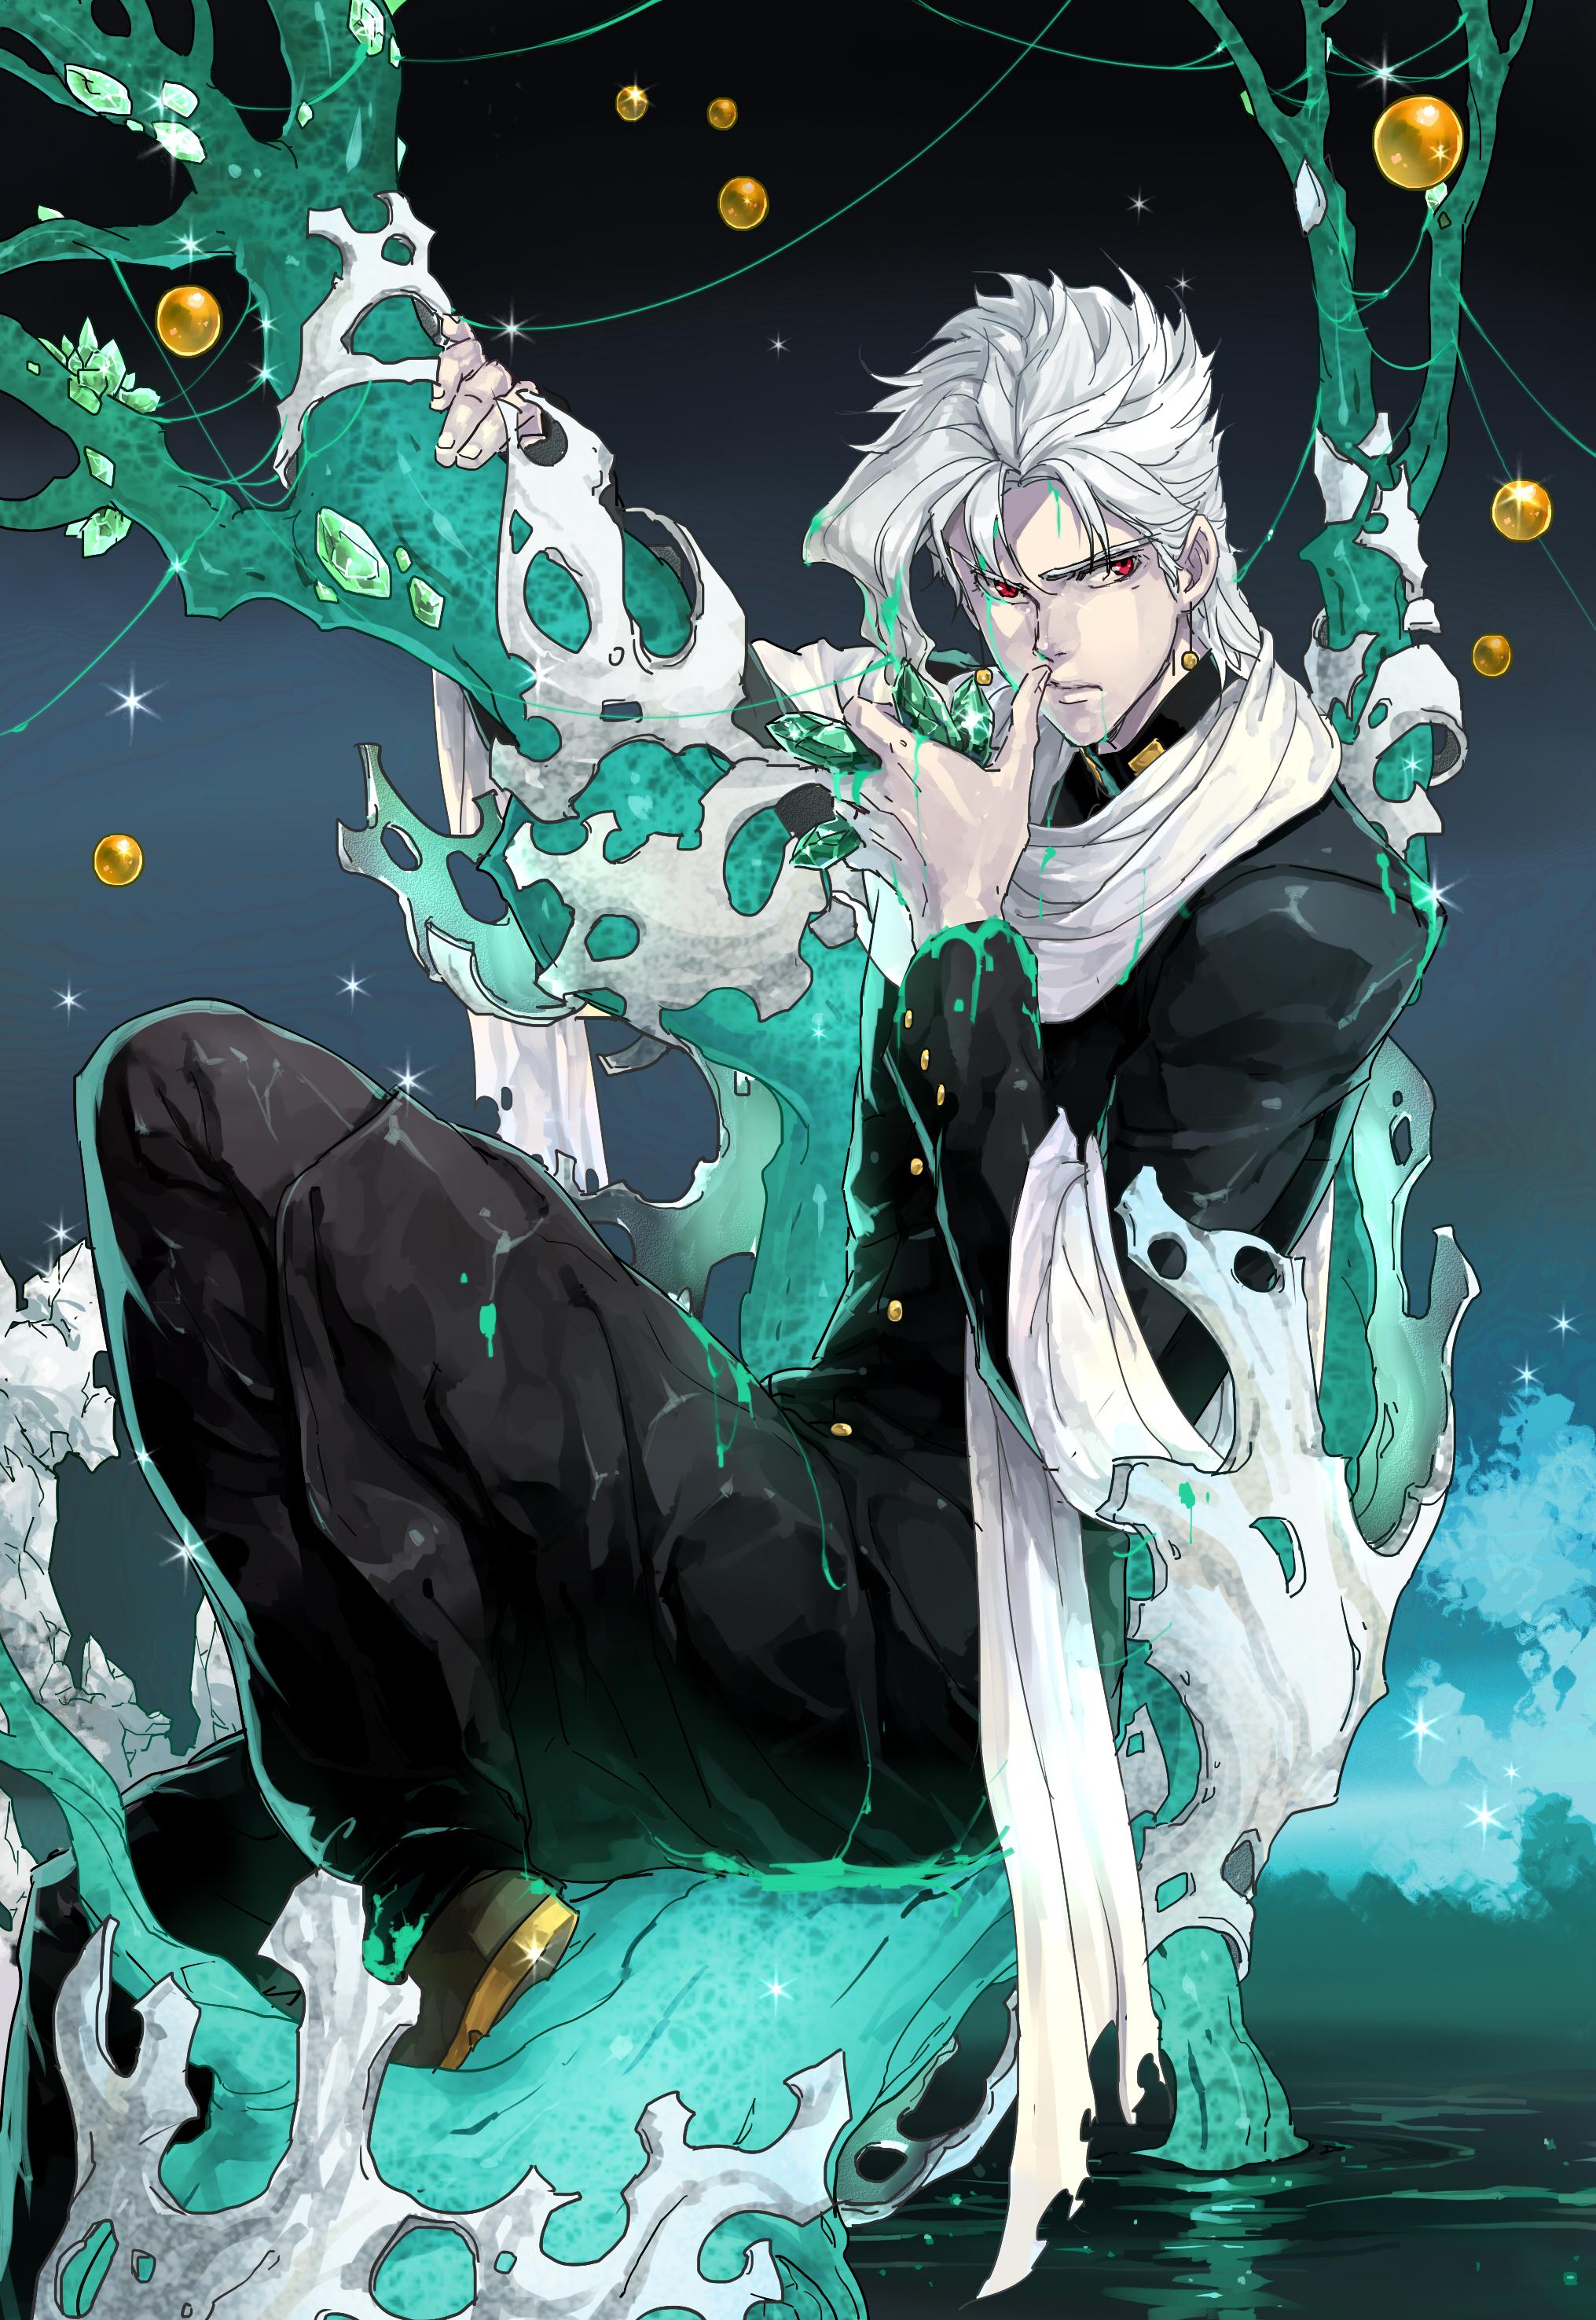 anime_wallpaper_JoJos_Bizarre_Adventure_1664083-44131611_big_p1.jpg